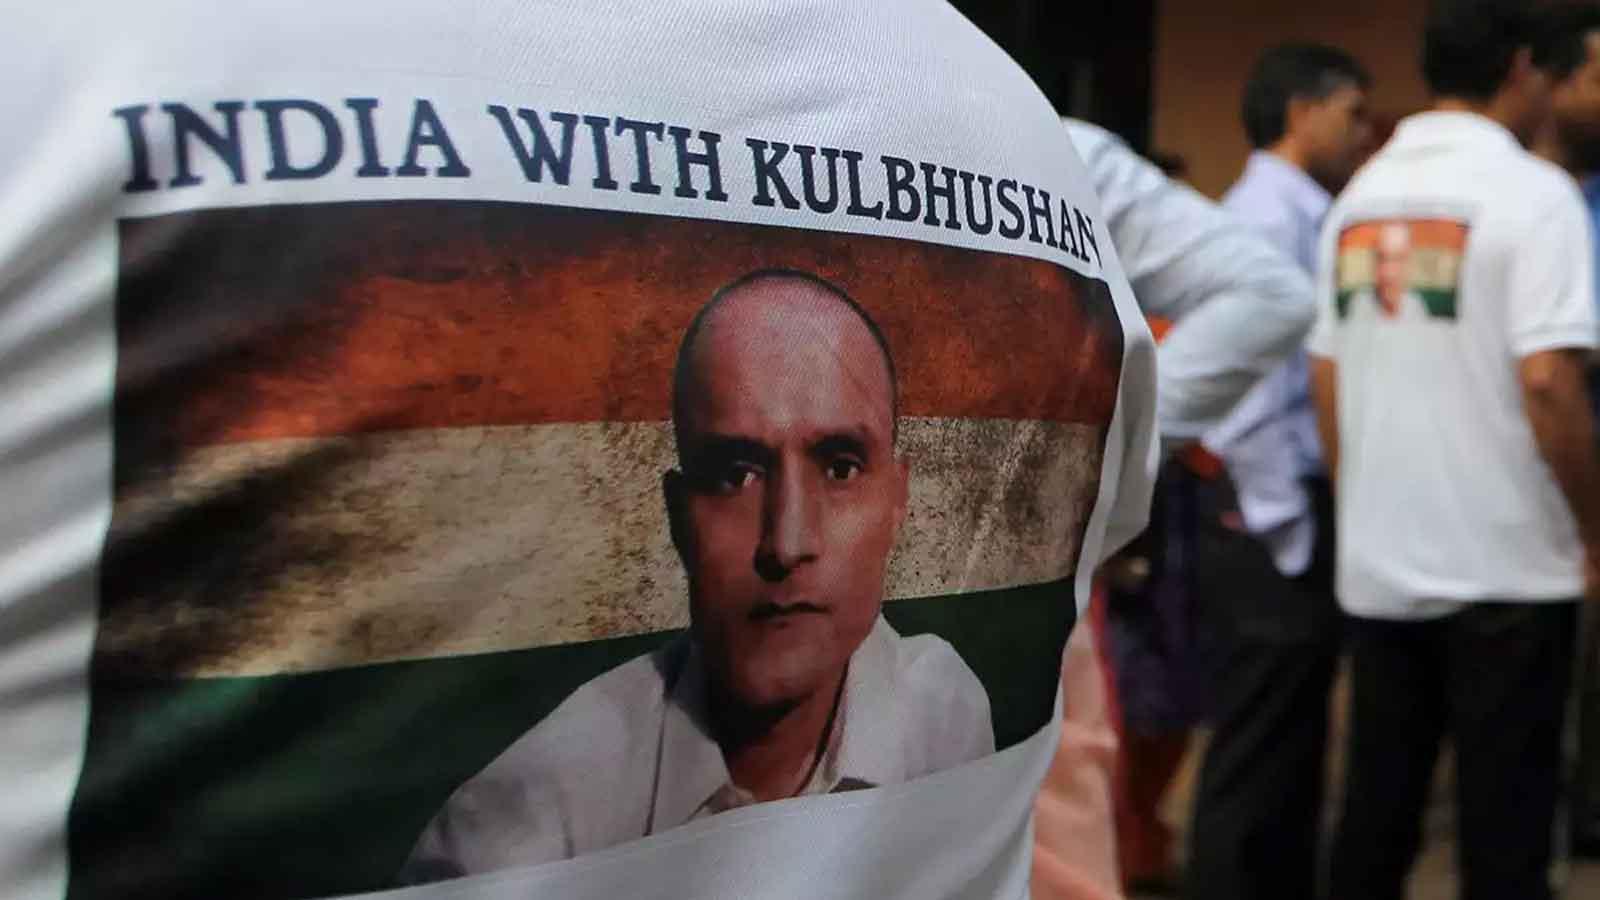 kulbhushan-jadhav-case-pakistan-not-complying-with-icj-orders-says-india